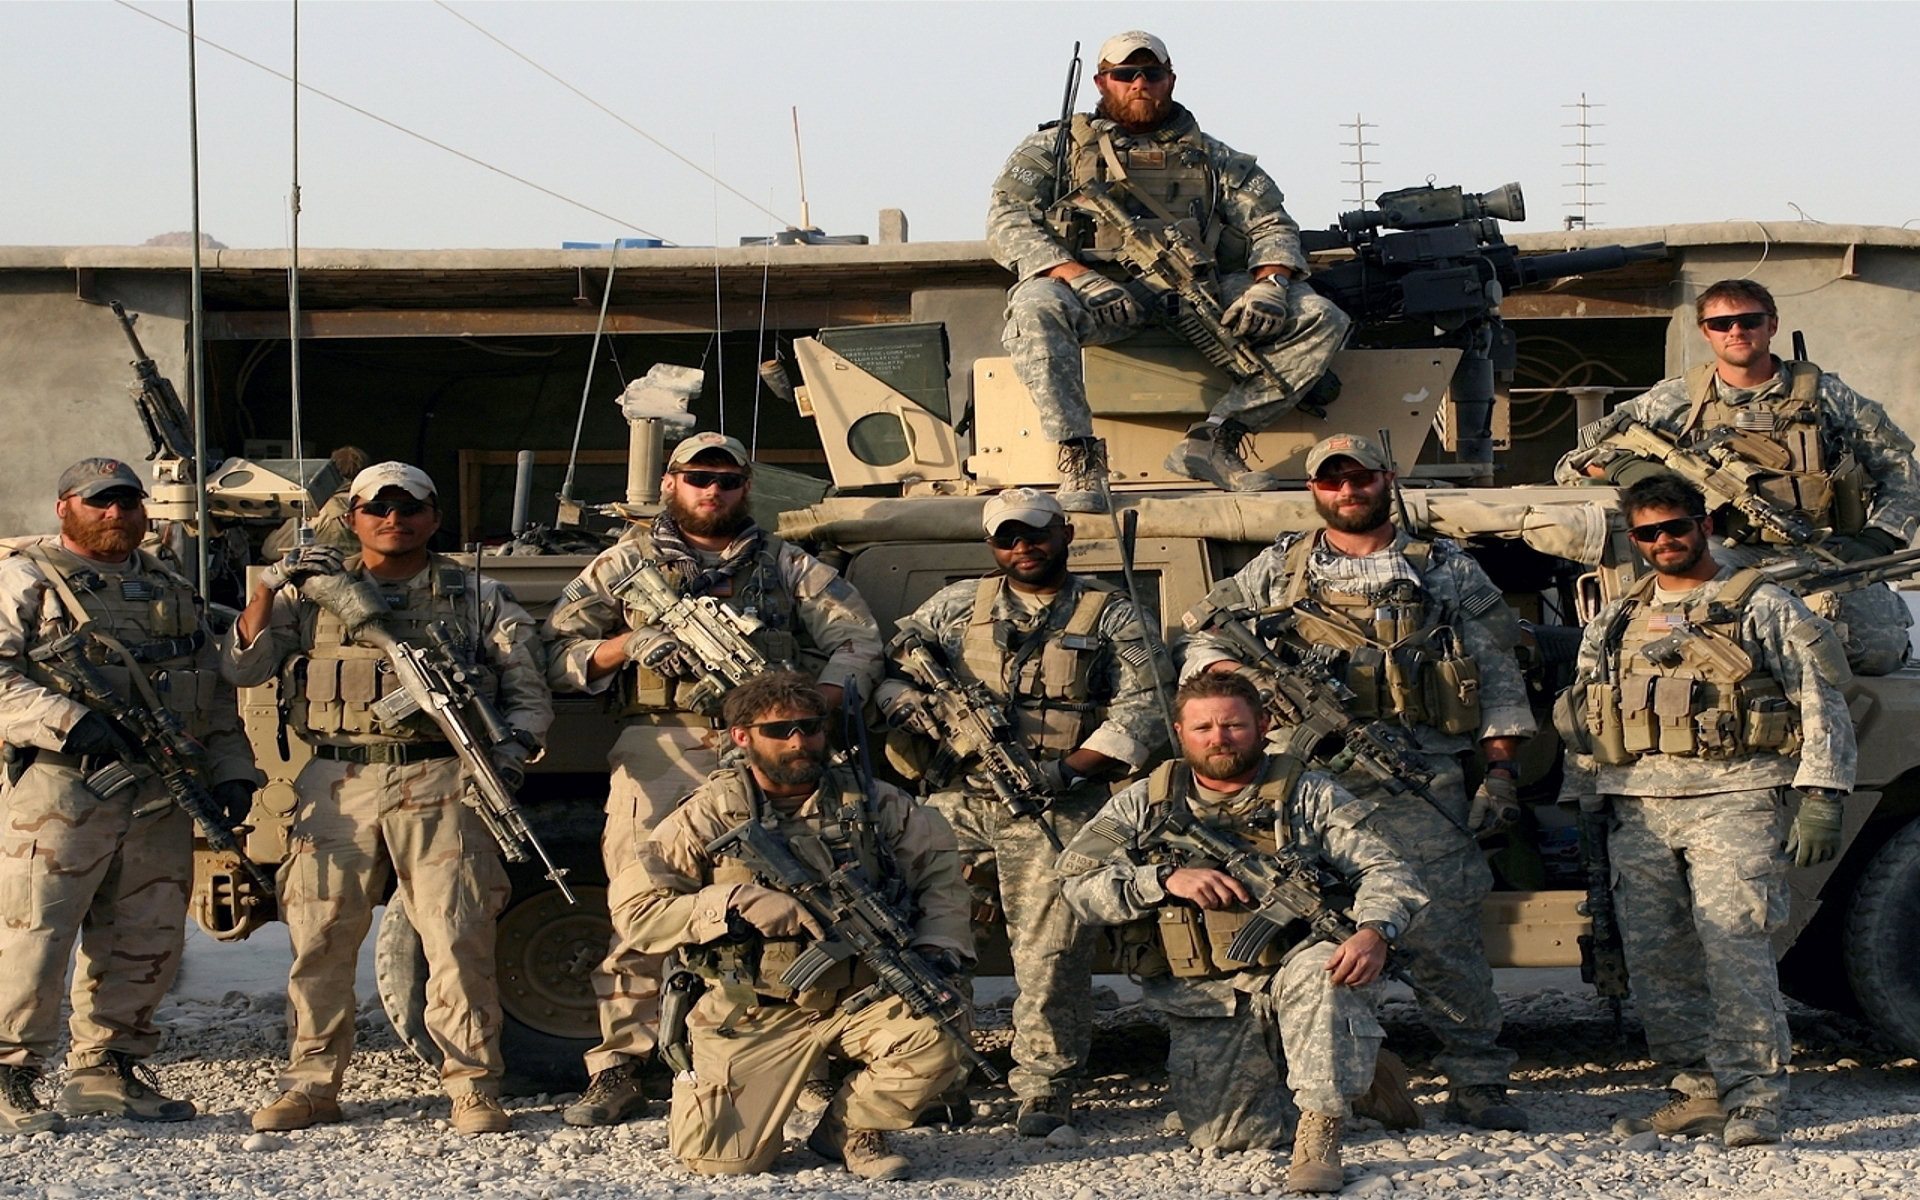 Afghan Girl Eyes Wallpaper Army Delta Force Wallpaper 67 Images